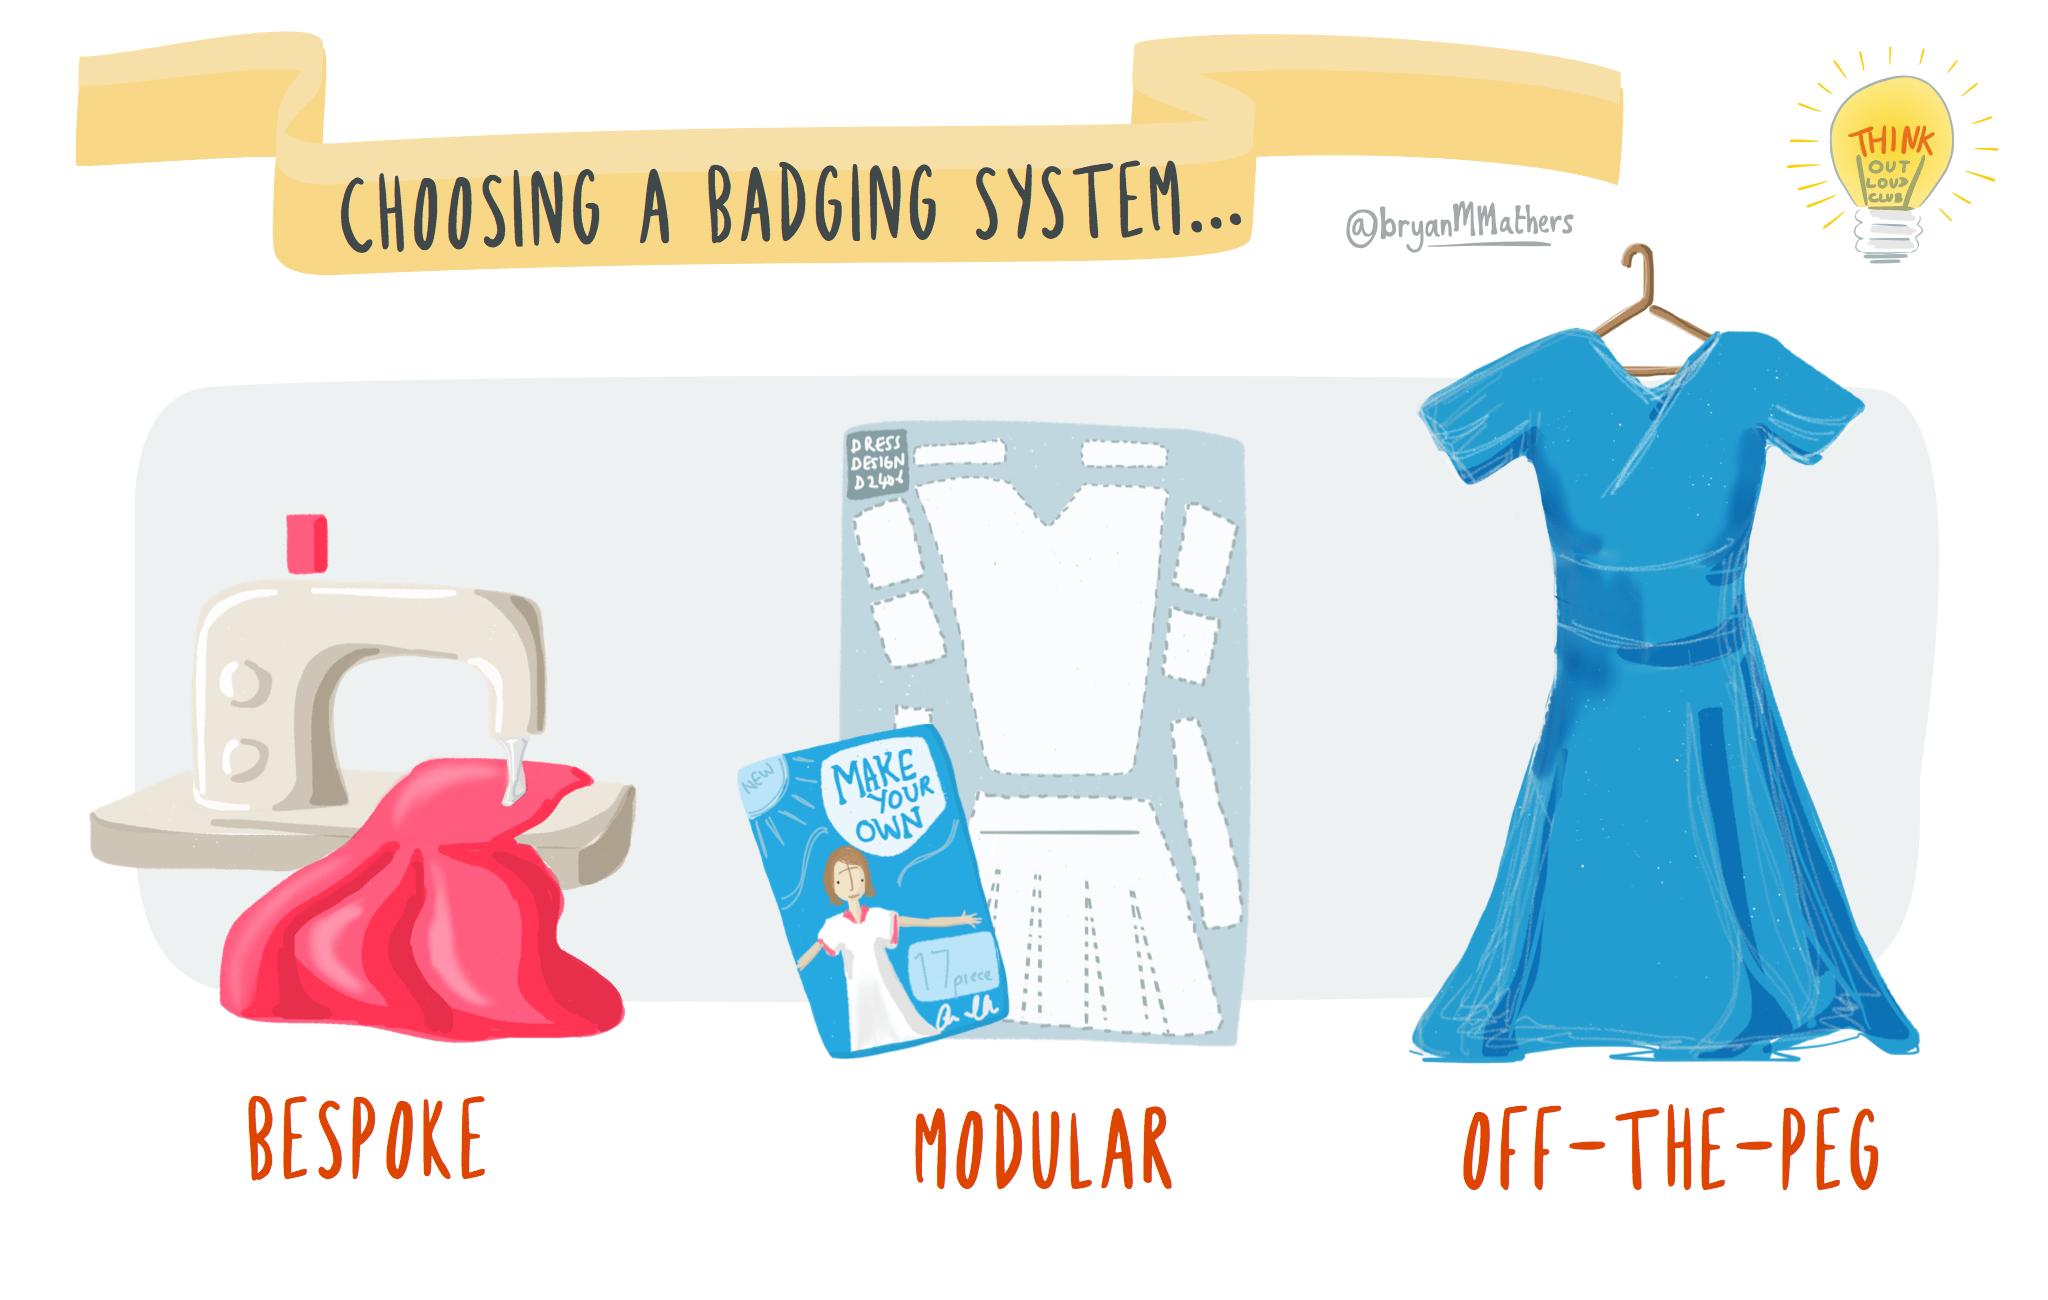 Choosing a badging system.